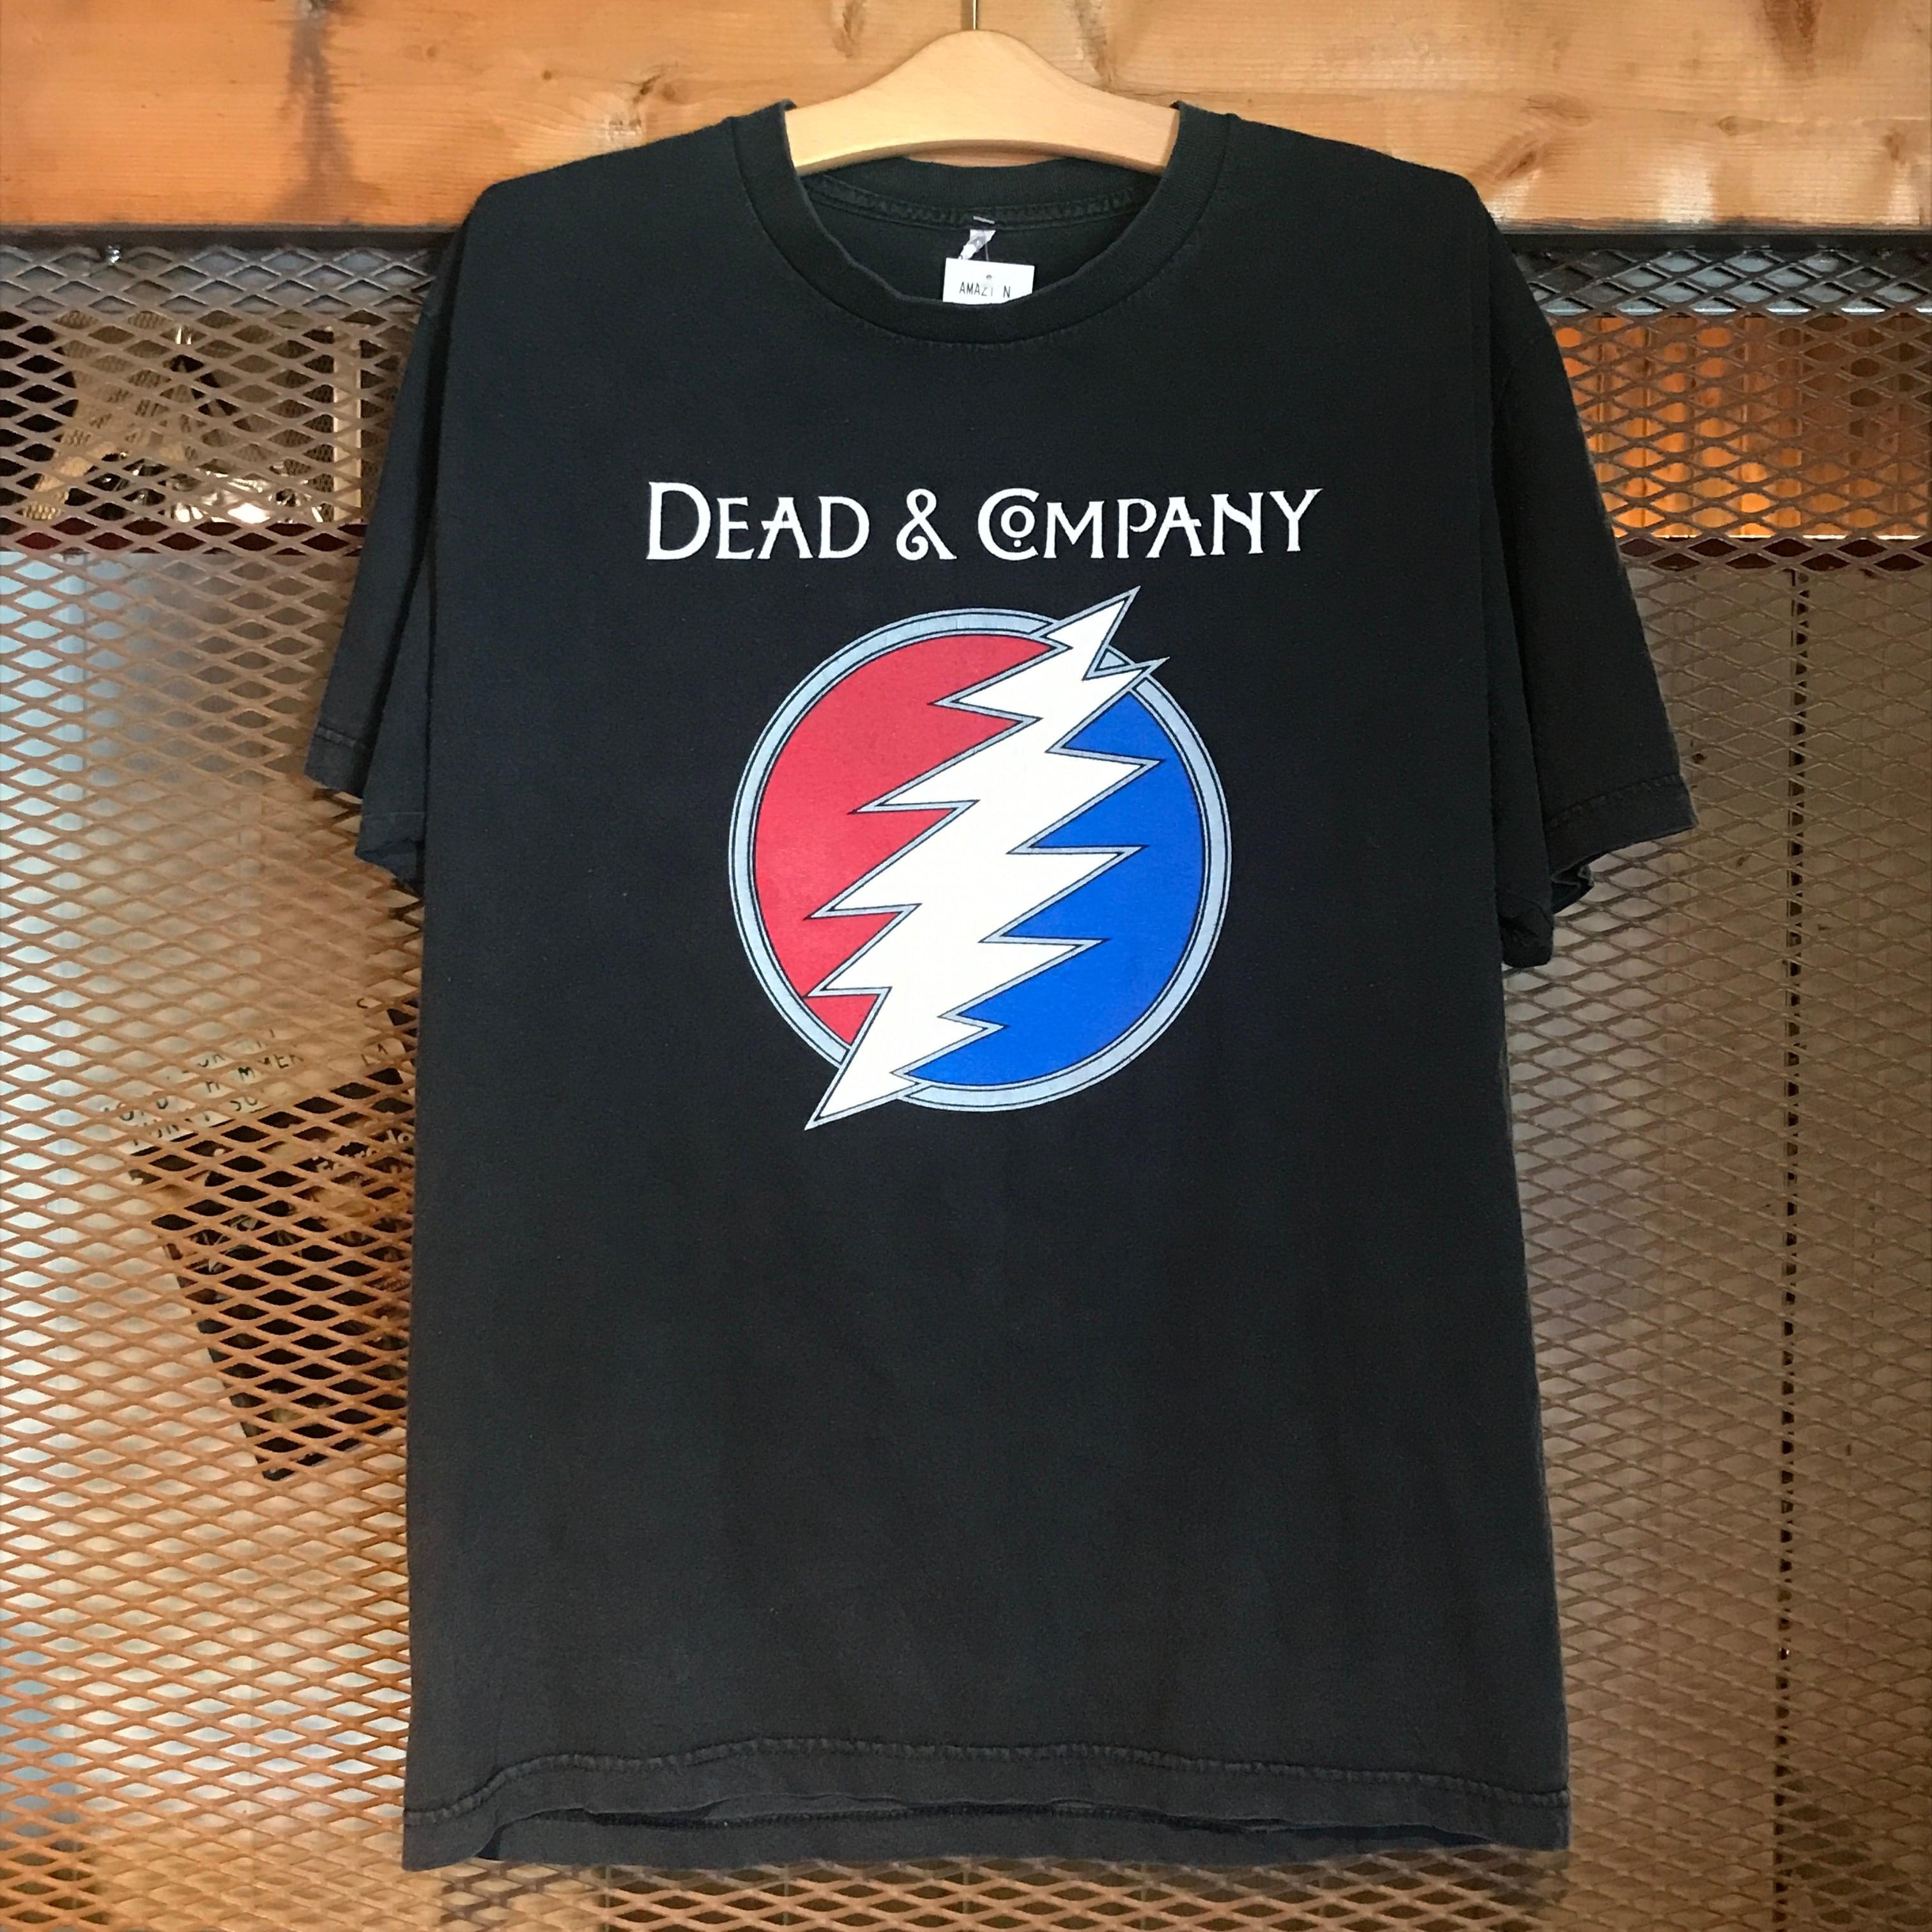 【Used】DEAD & COMPANY Tee